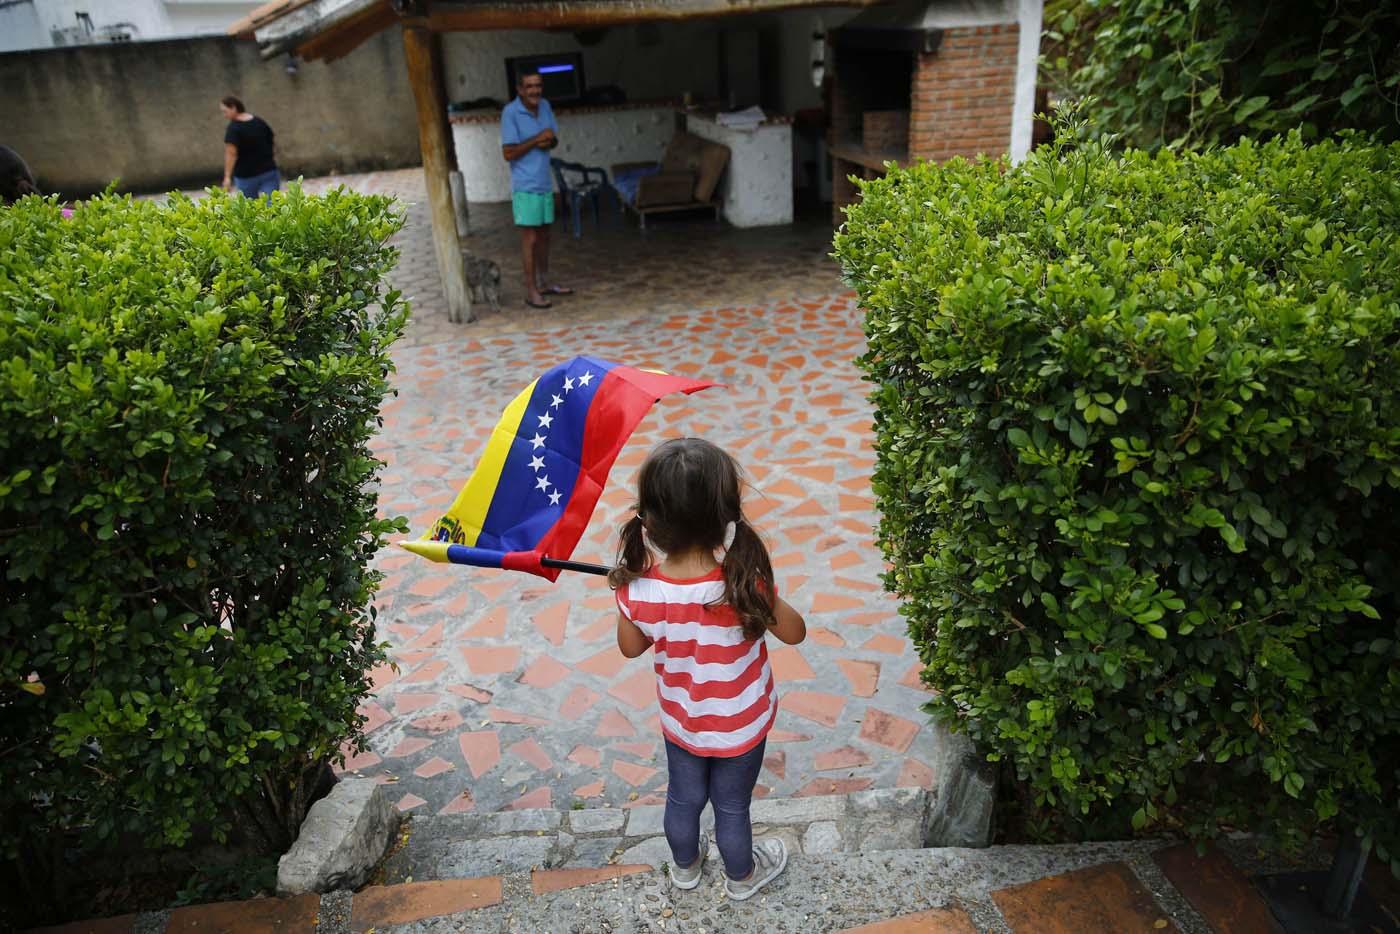 2014-10-15T131015Z_2126950177_GM1EAAF1LRY01_RTRMADP_3_VENEZUELA-MIGRATION (1)